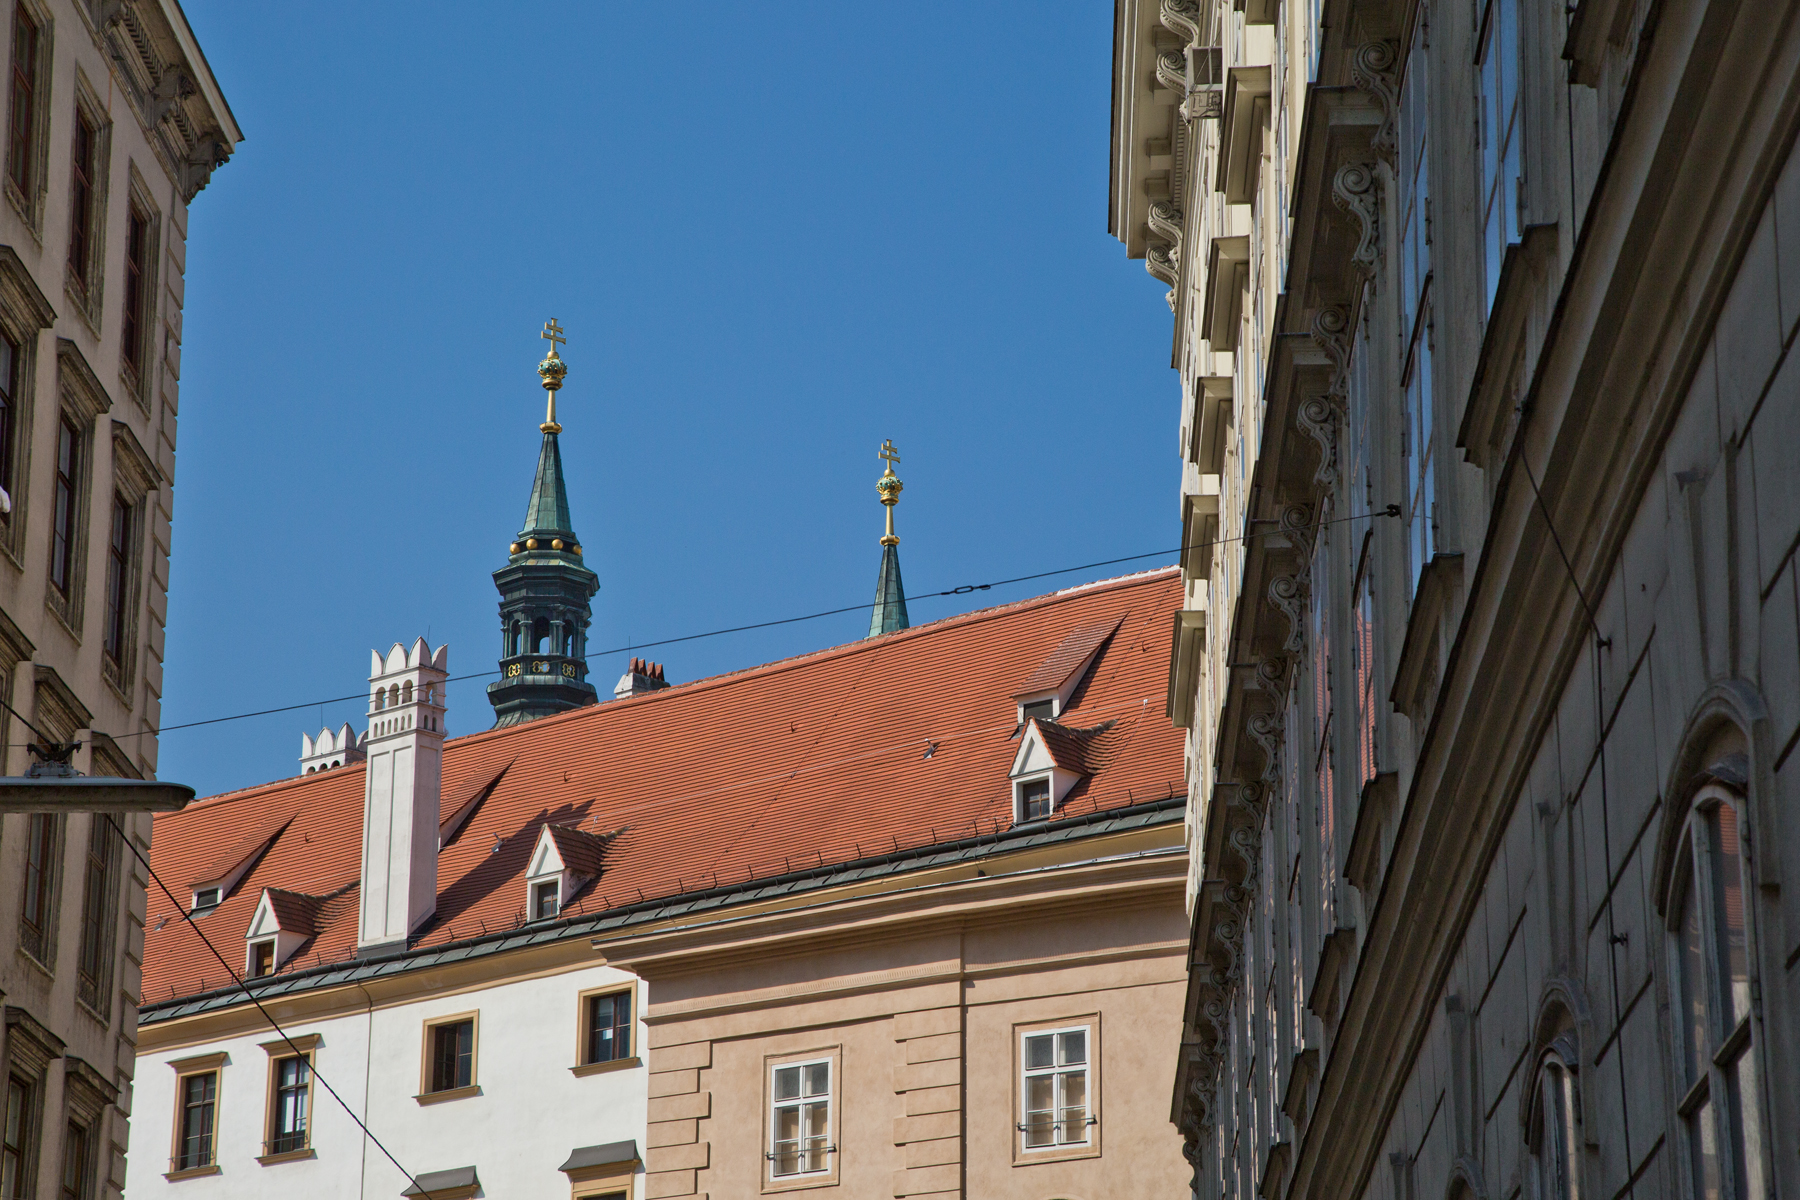 Dachportrait mit Turm